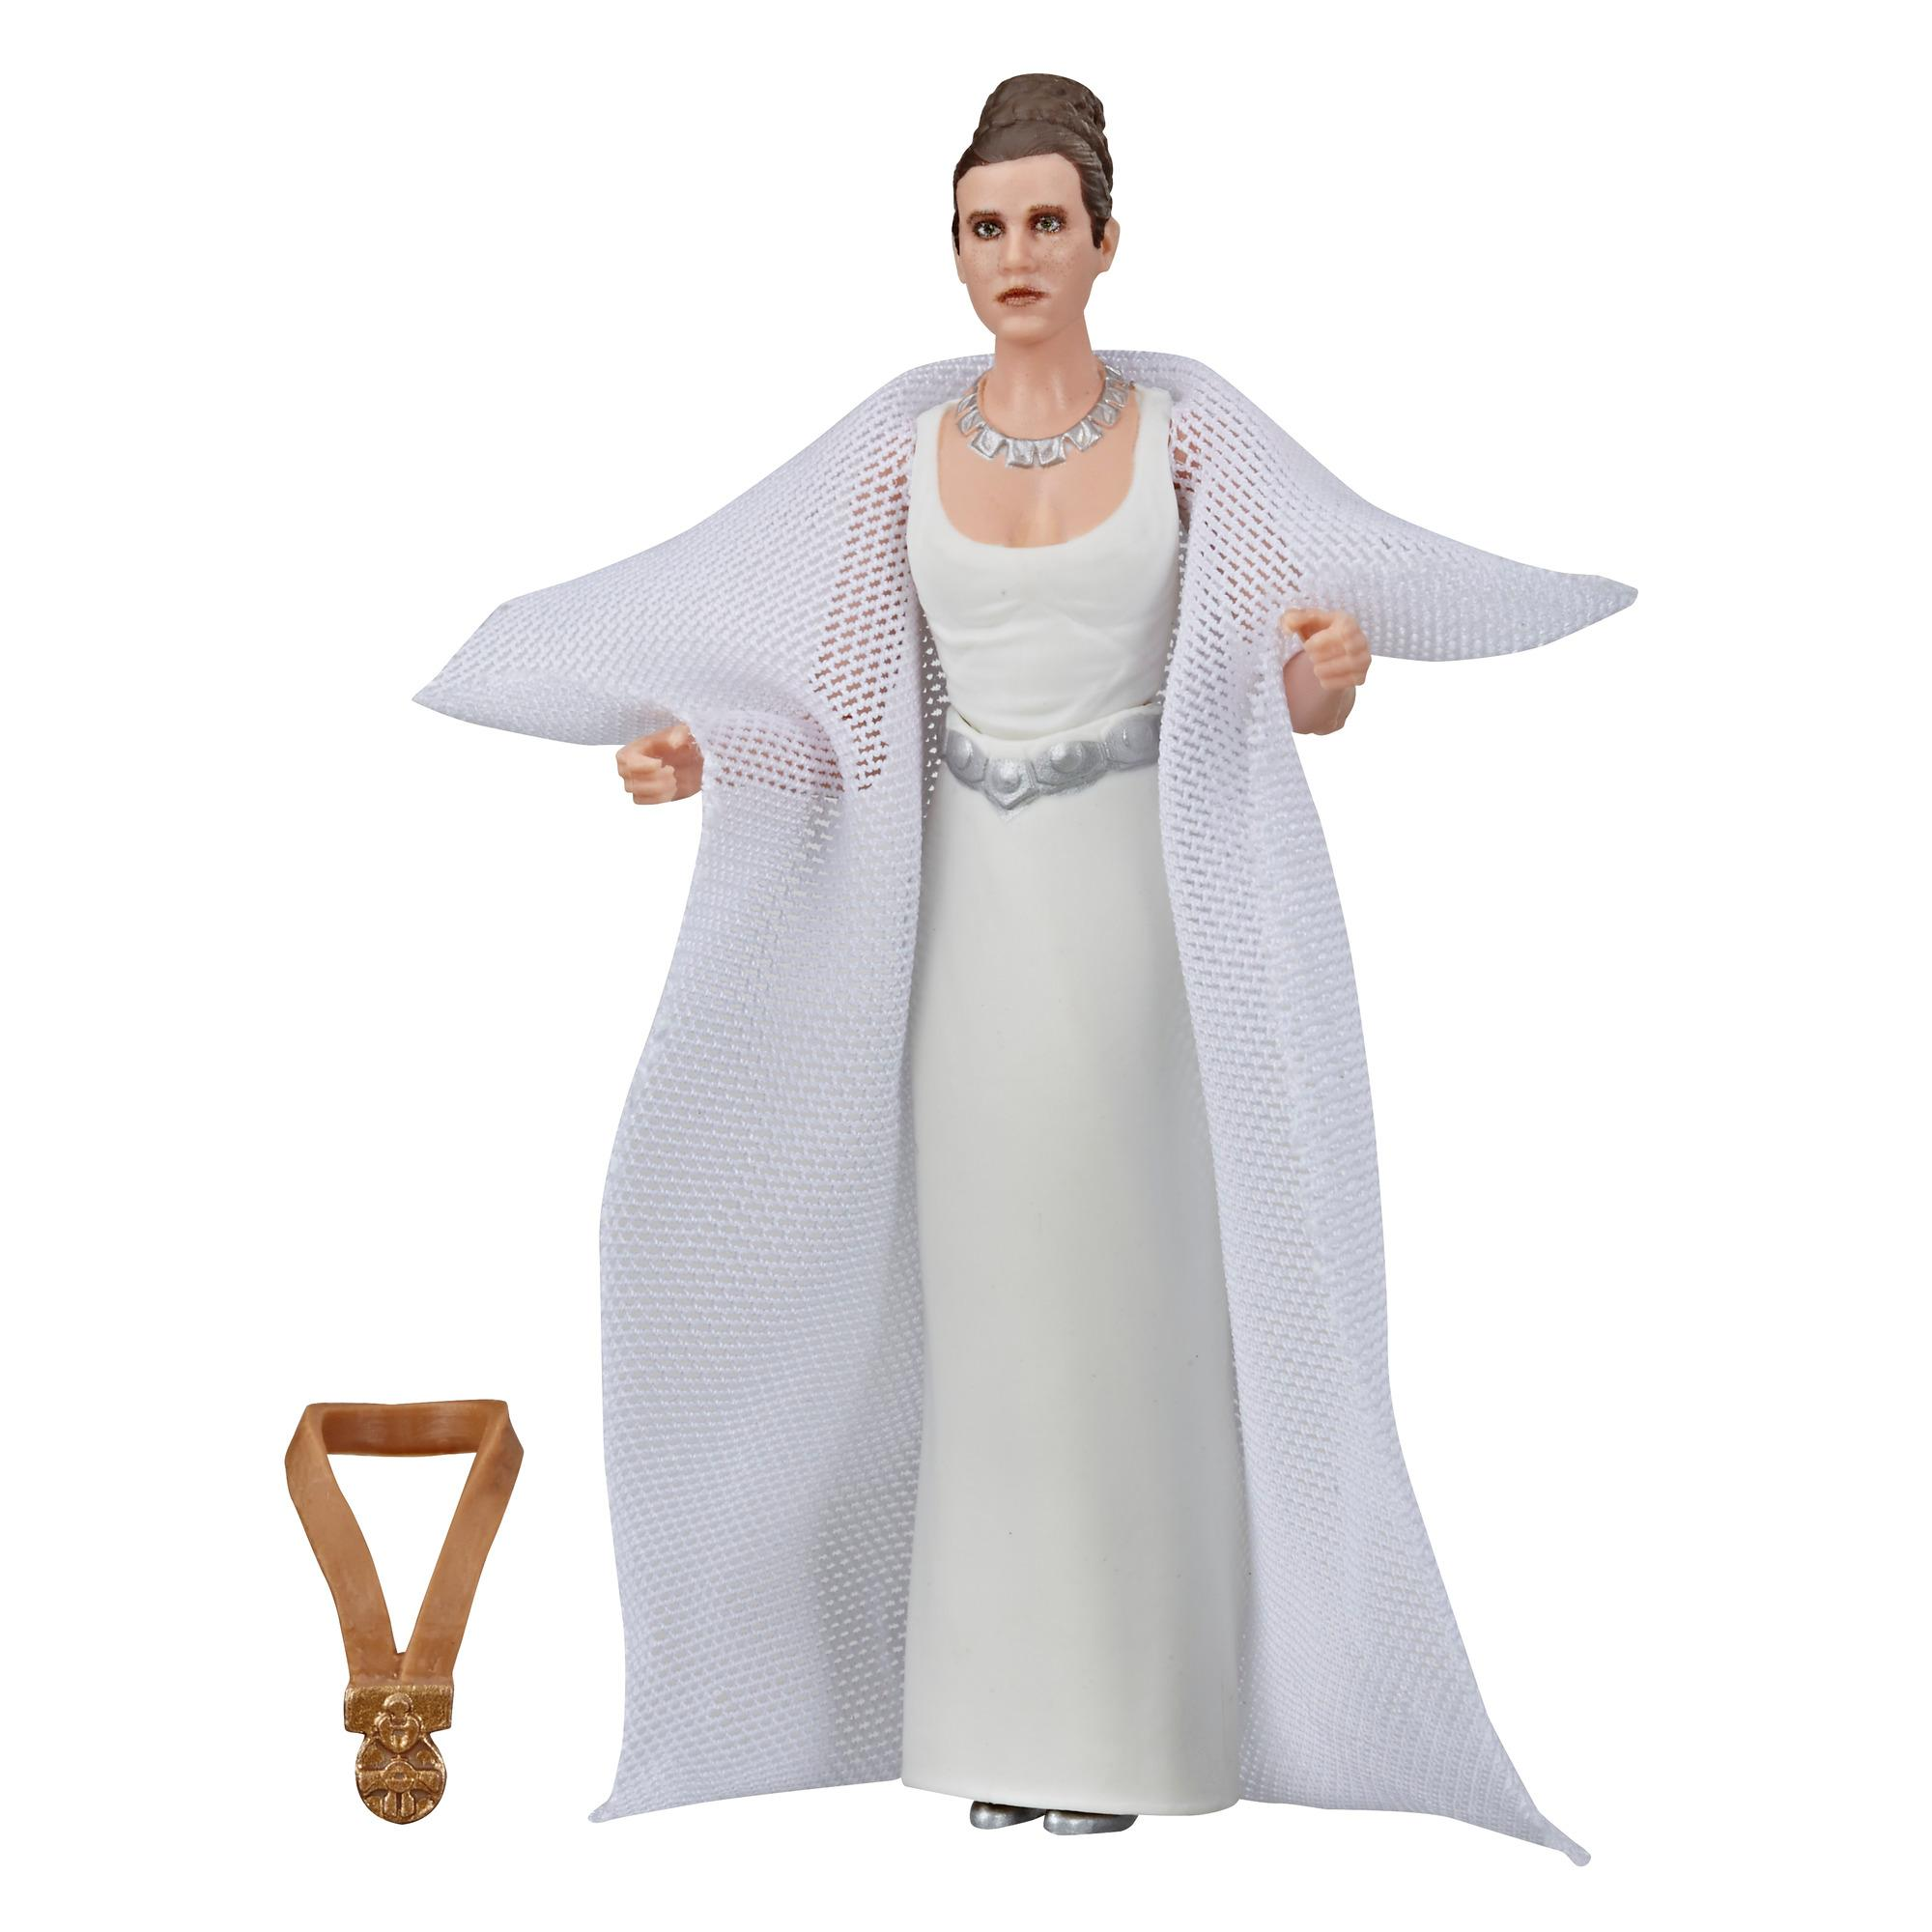 Star Wars The Vintage Collection, Star Wars : Un nouvel espoir, figurine de la princesse Leia Organa (Yavin) de 9,5 cm